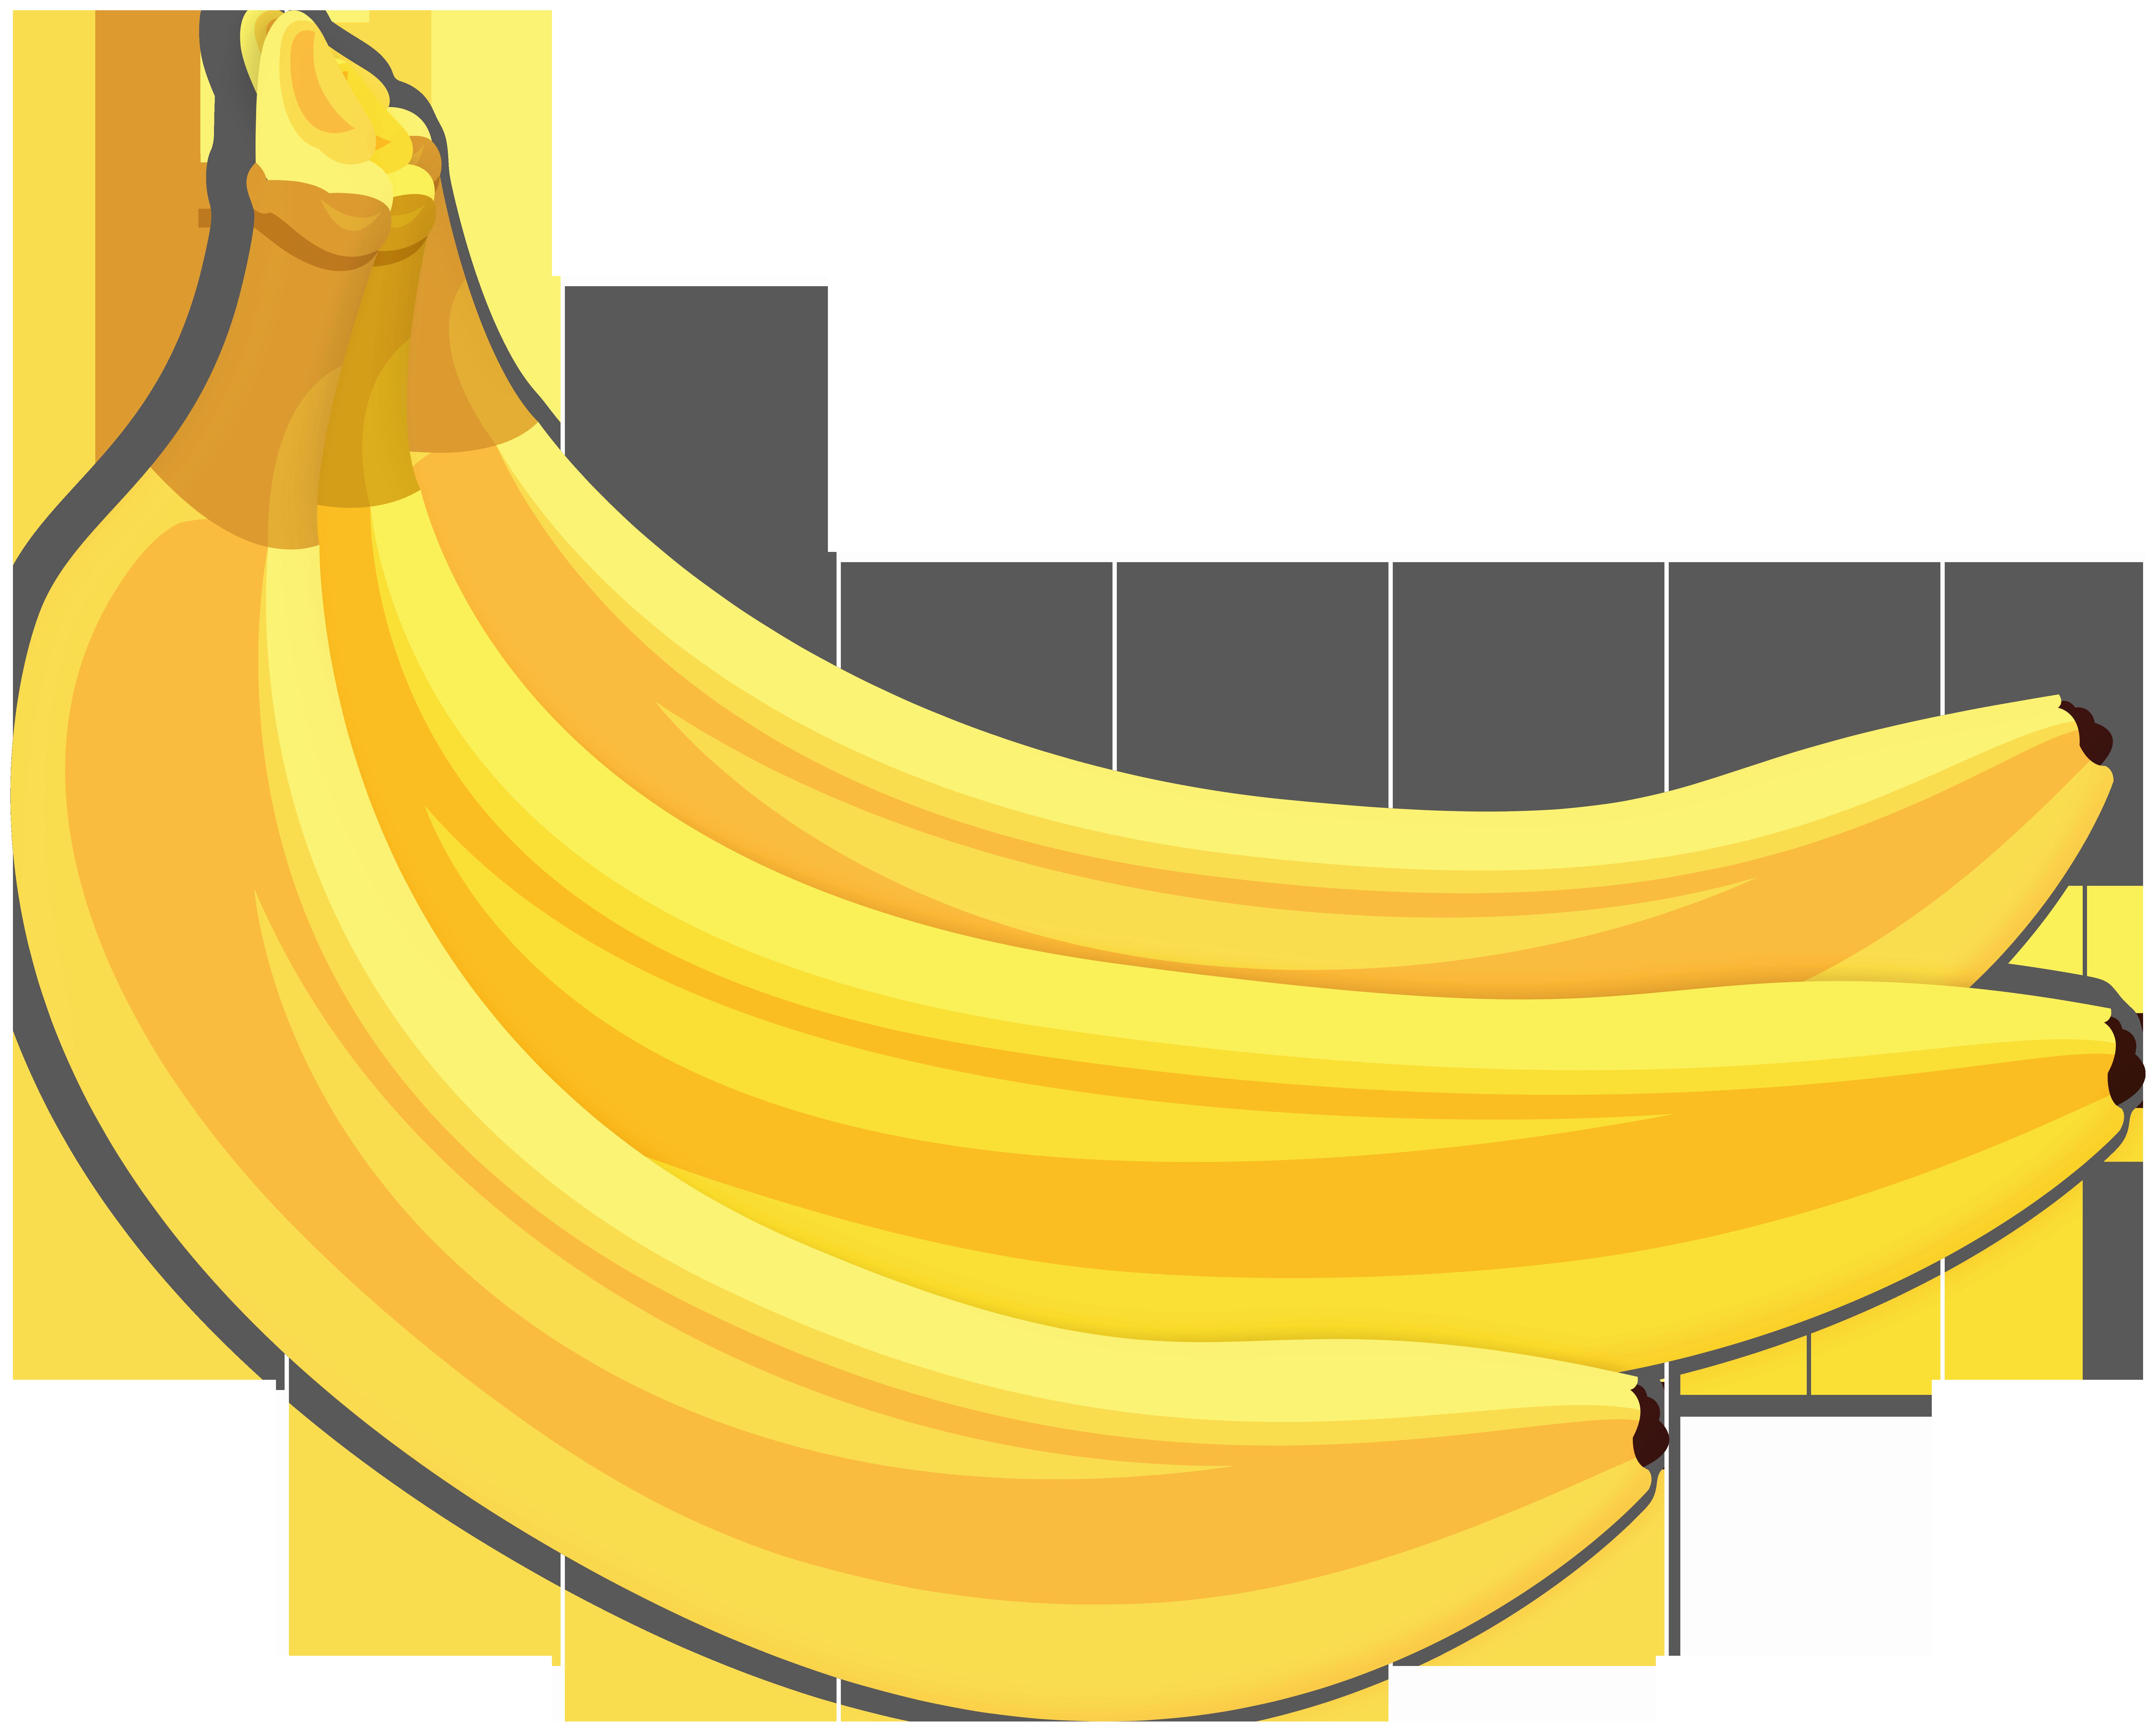 Banana clipart high quality. Bananas png clip art